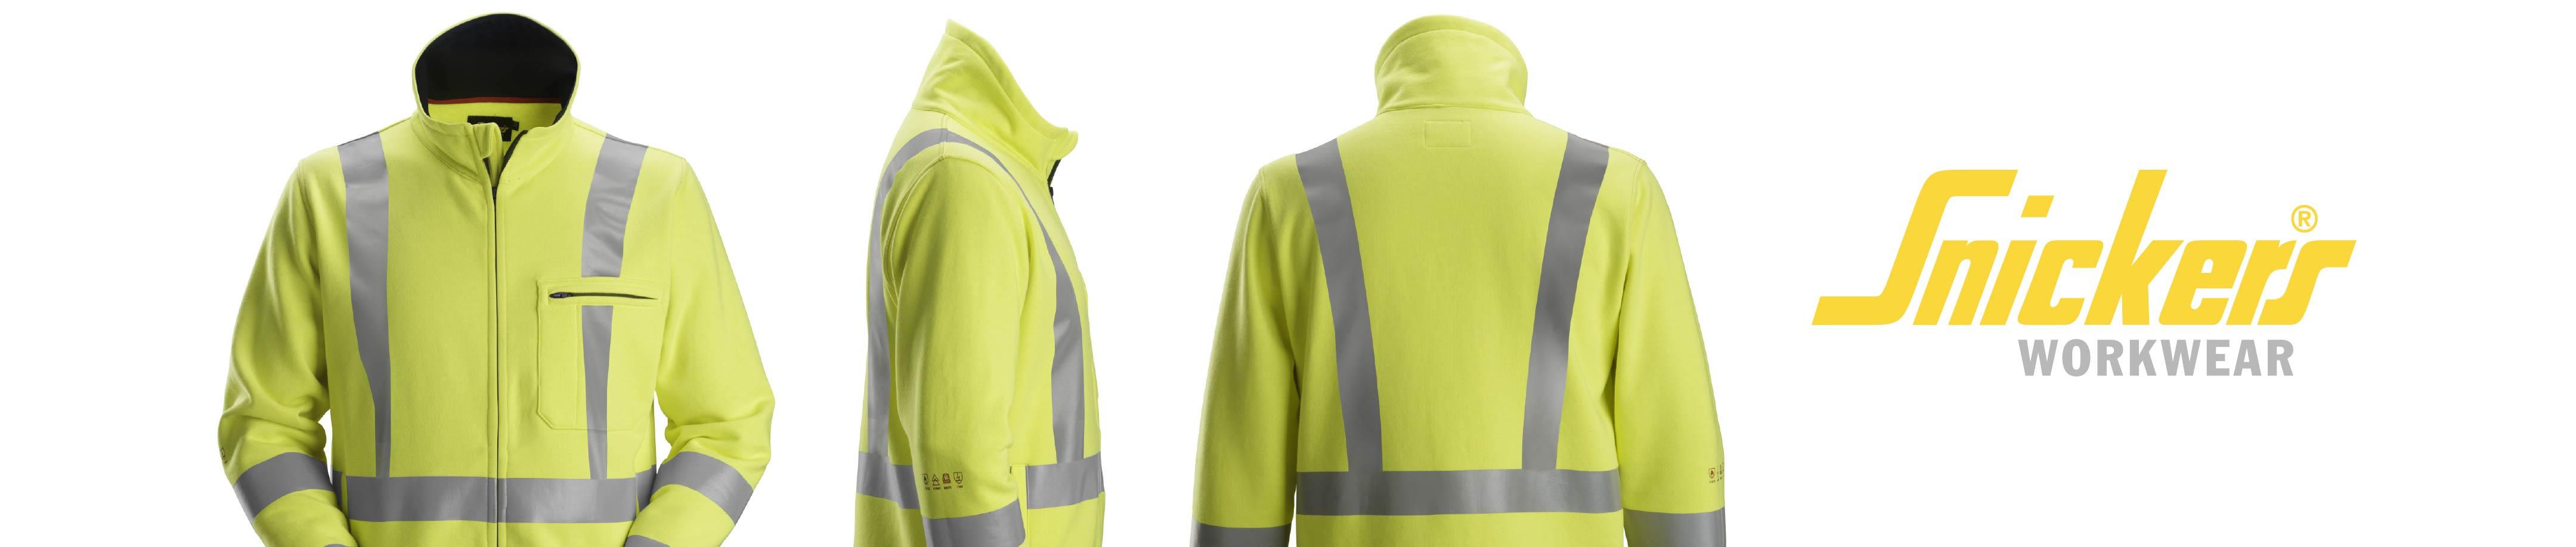 Flame retardant work vests